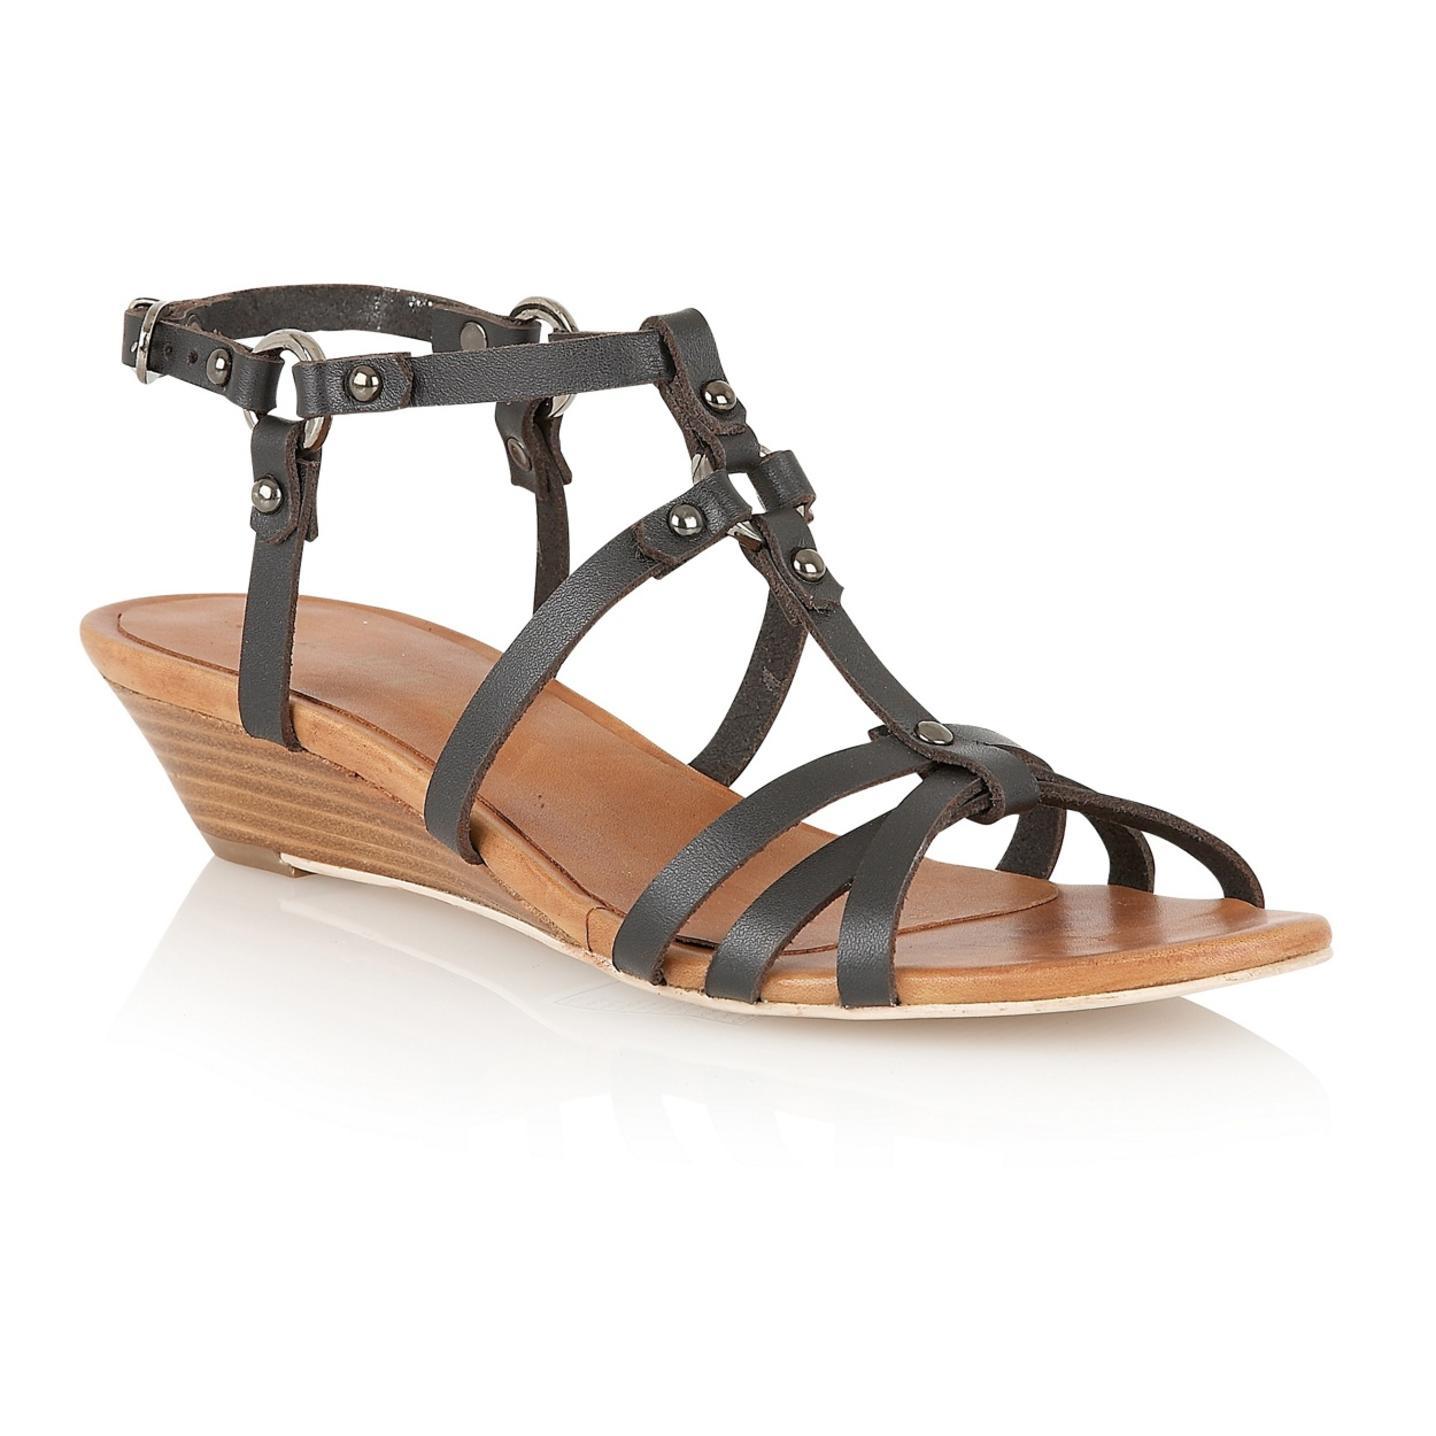 Strappy Wedge Sandals Craftysandals Com